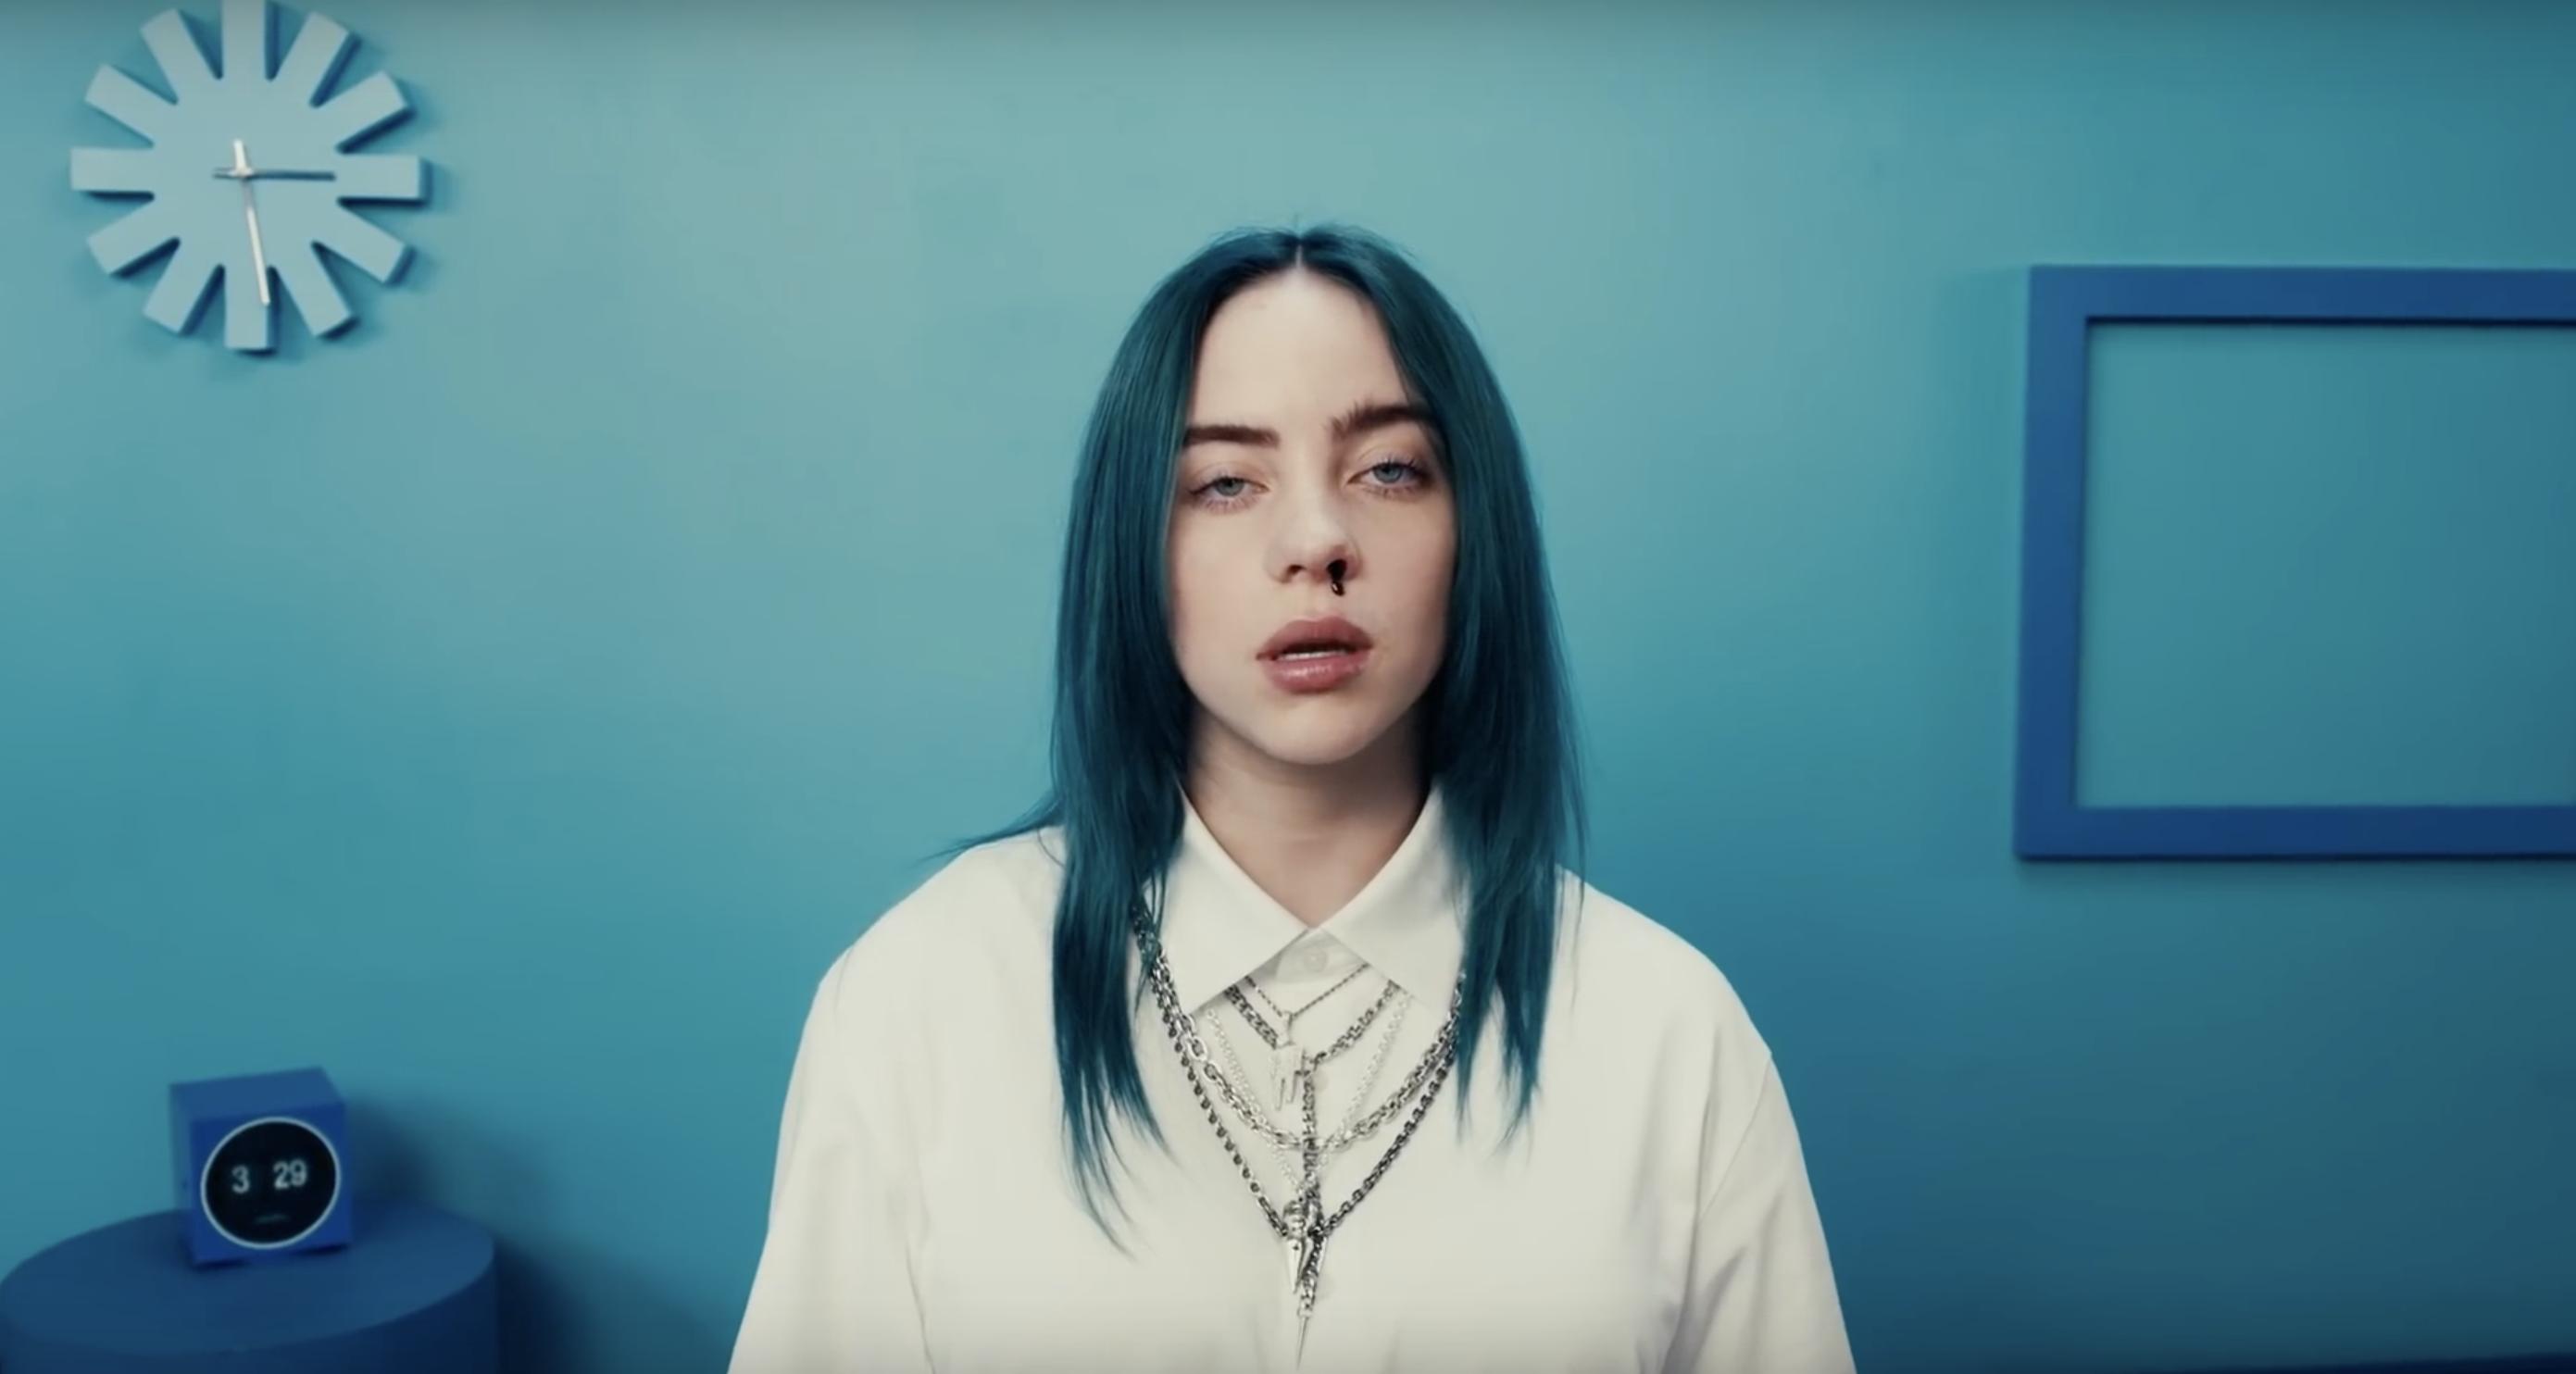 Billie Eilish - Apple Music awards 2019 -